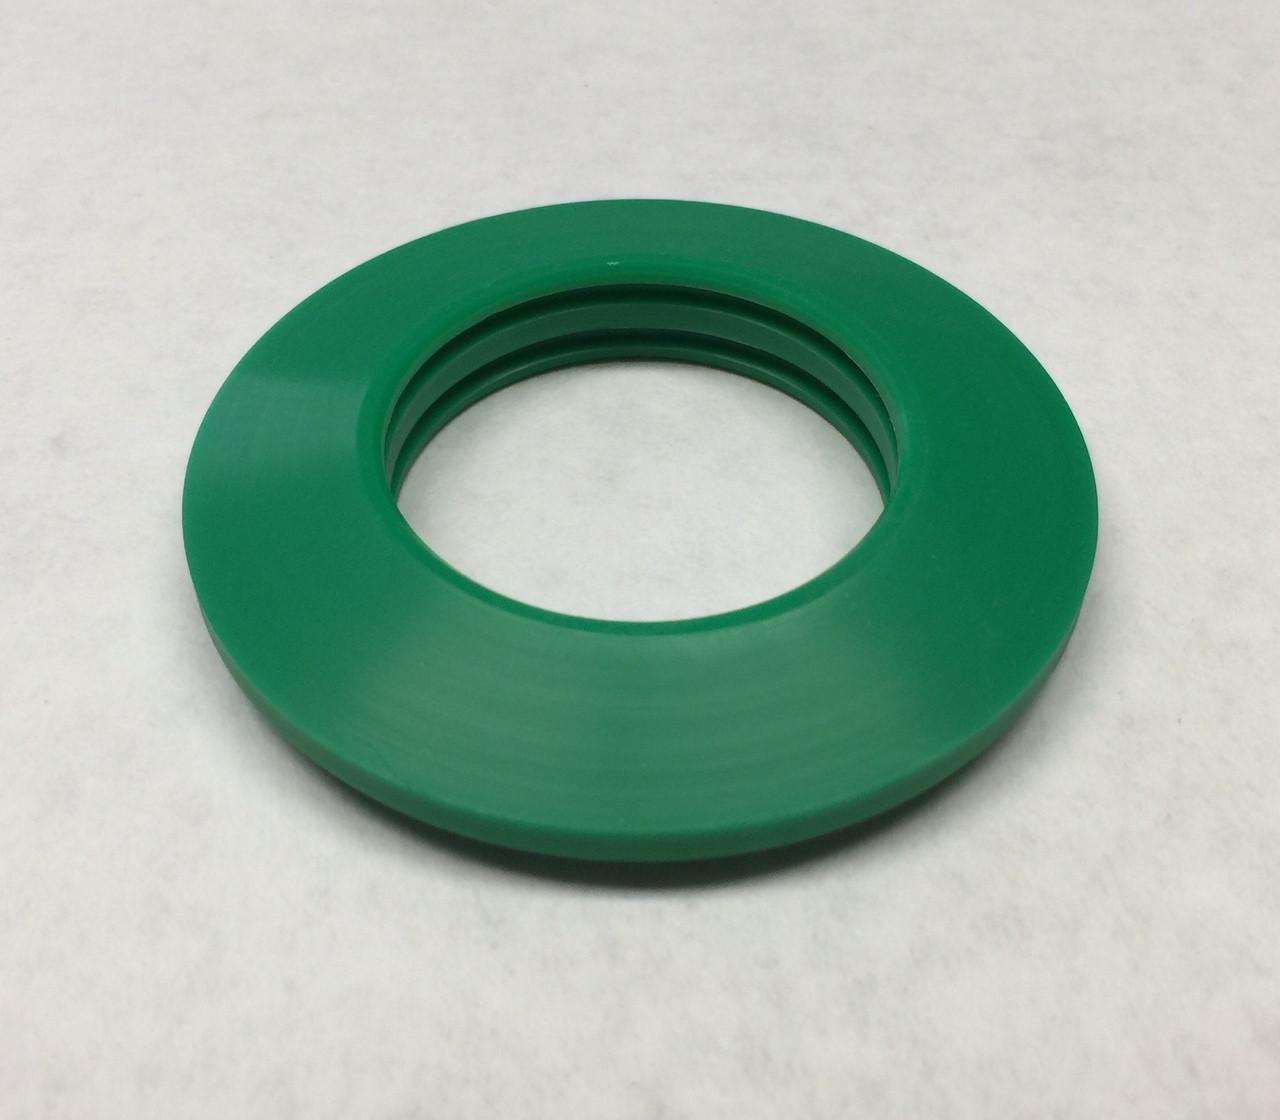 Talsa K-641 - K15e & K15v - Seperator Ring, Green Plastic - 7367